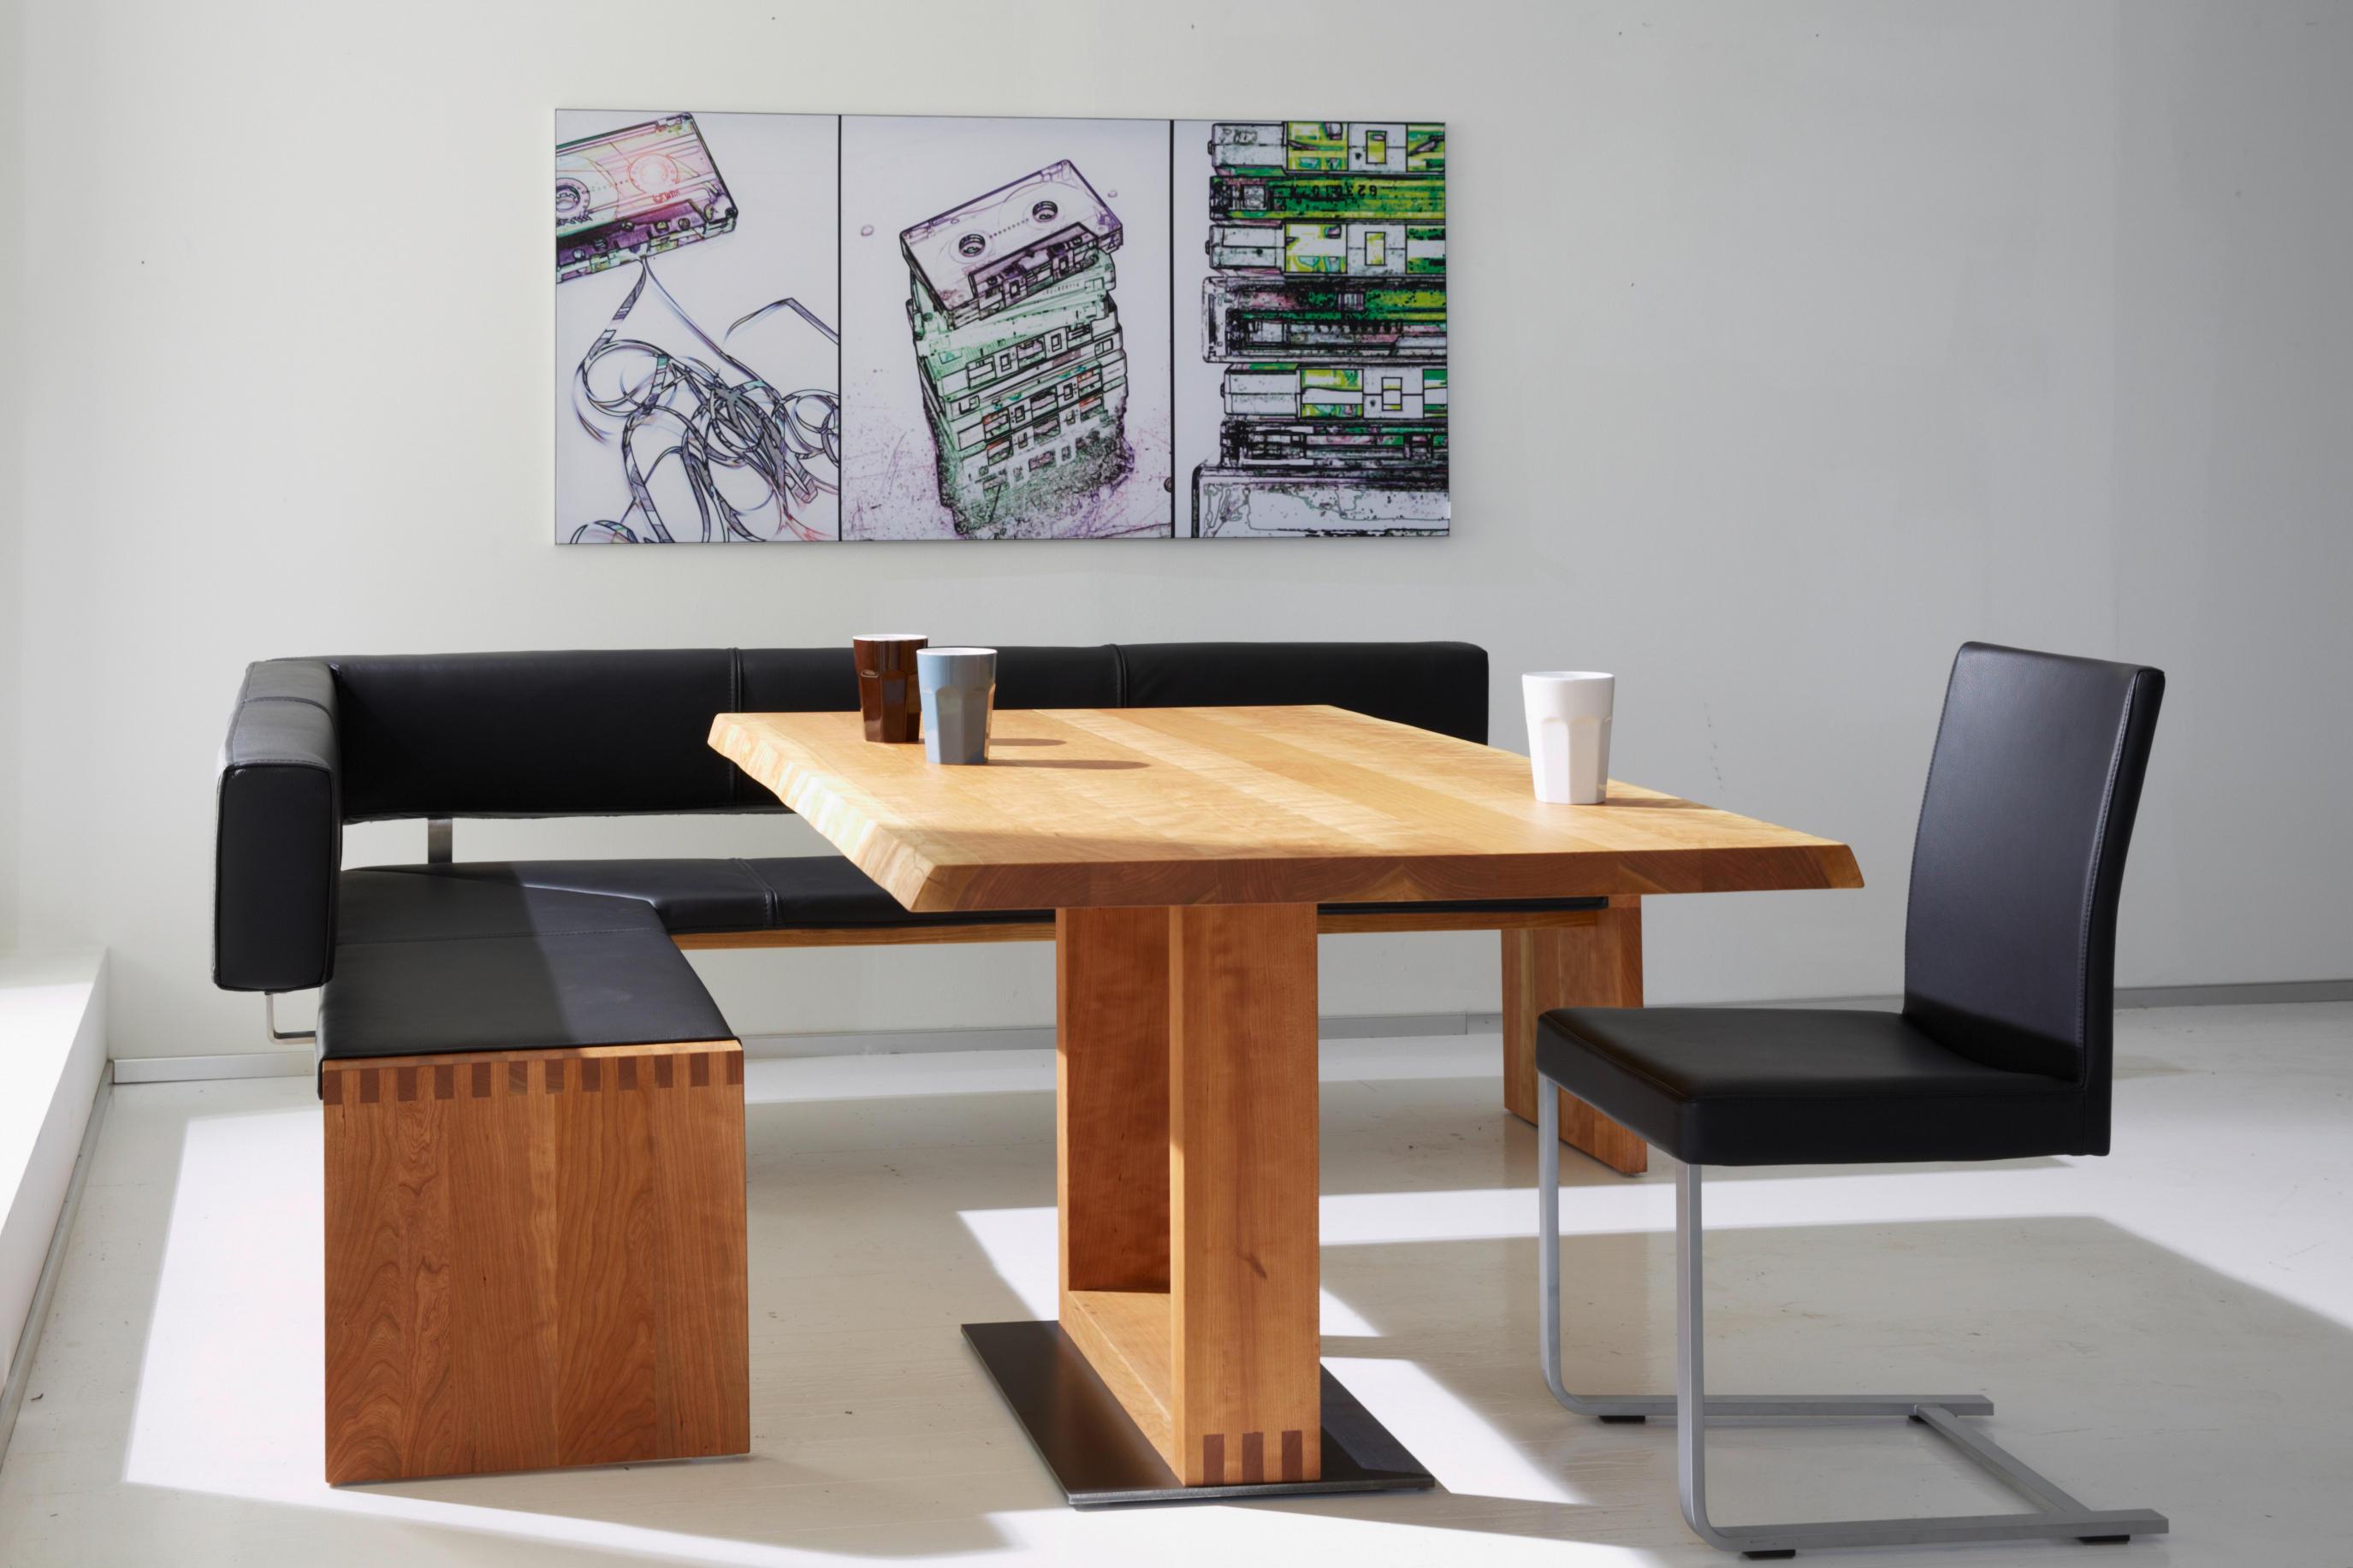 Eckbänke design  Design Eckbankgruppe – kazanlegend.info